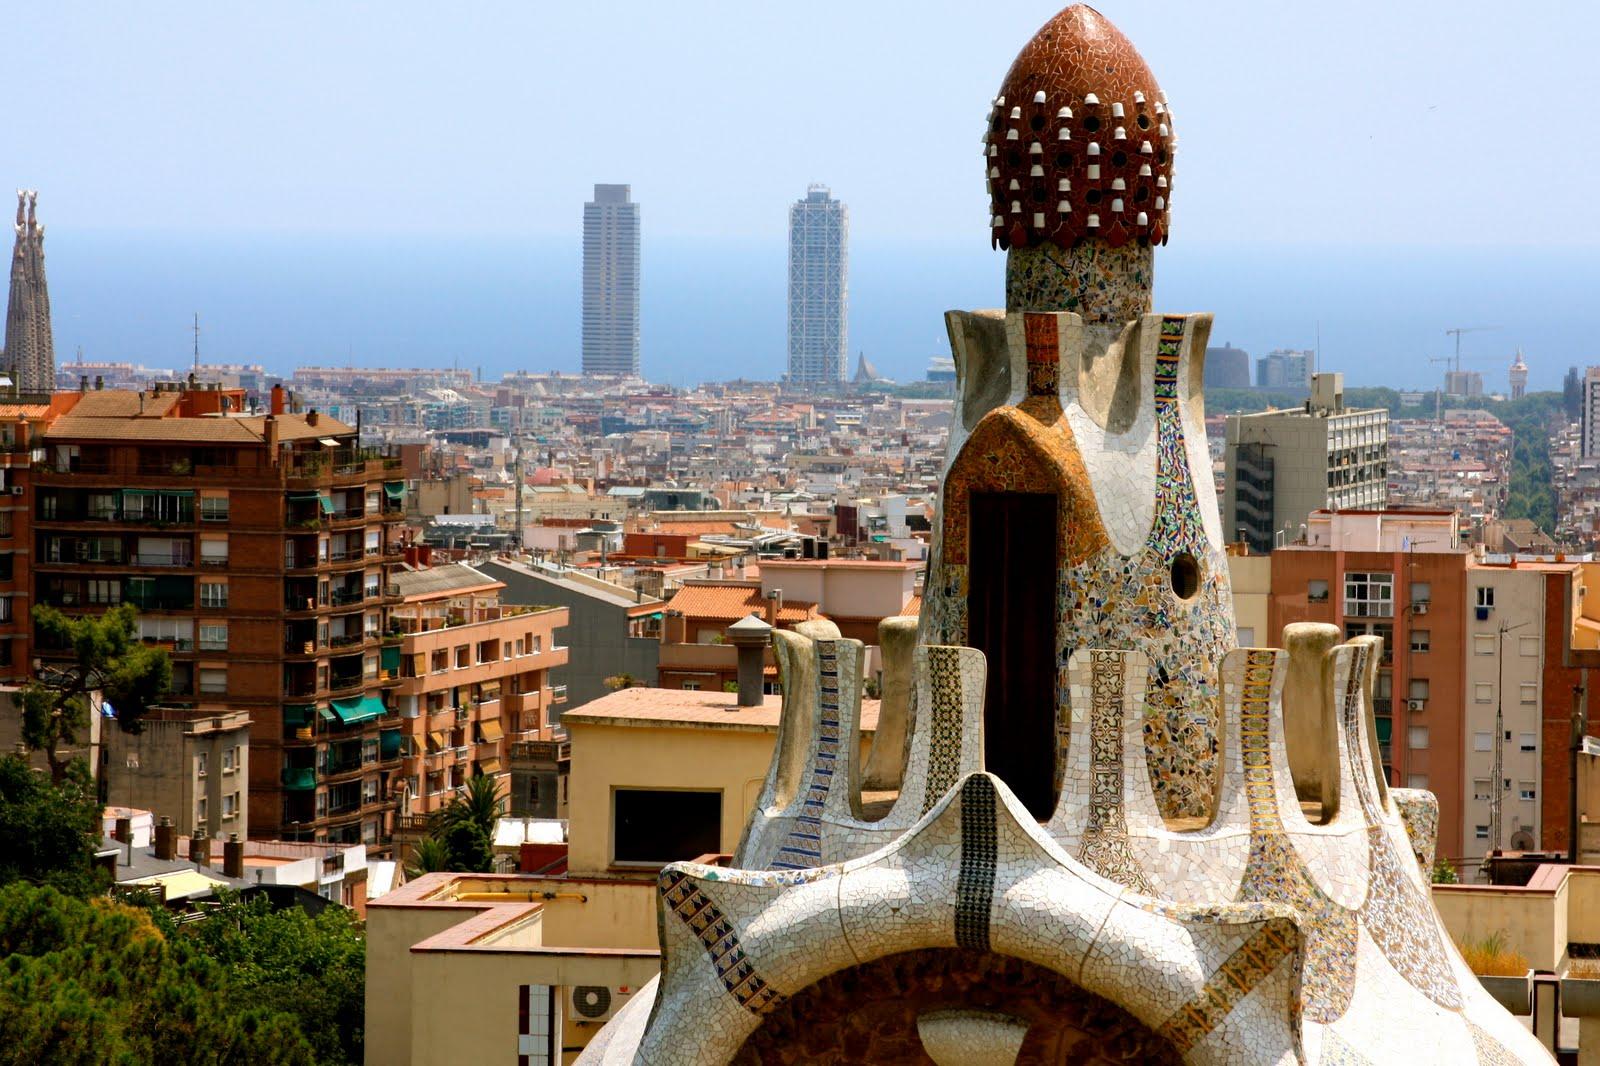 House Of Sway Barcelona In Snapshots